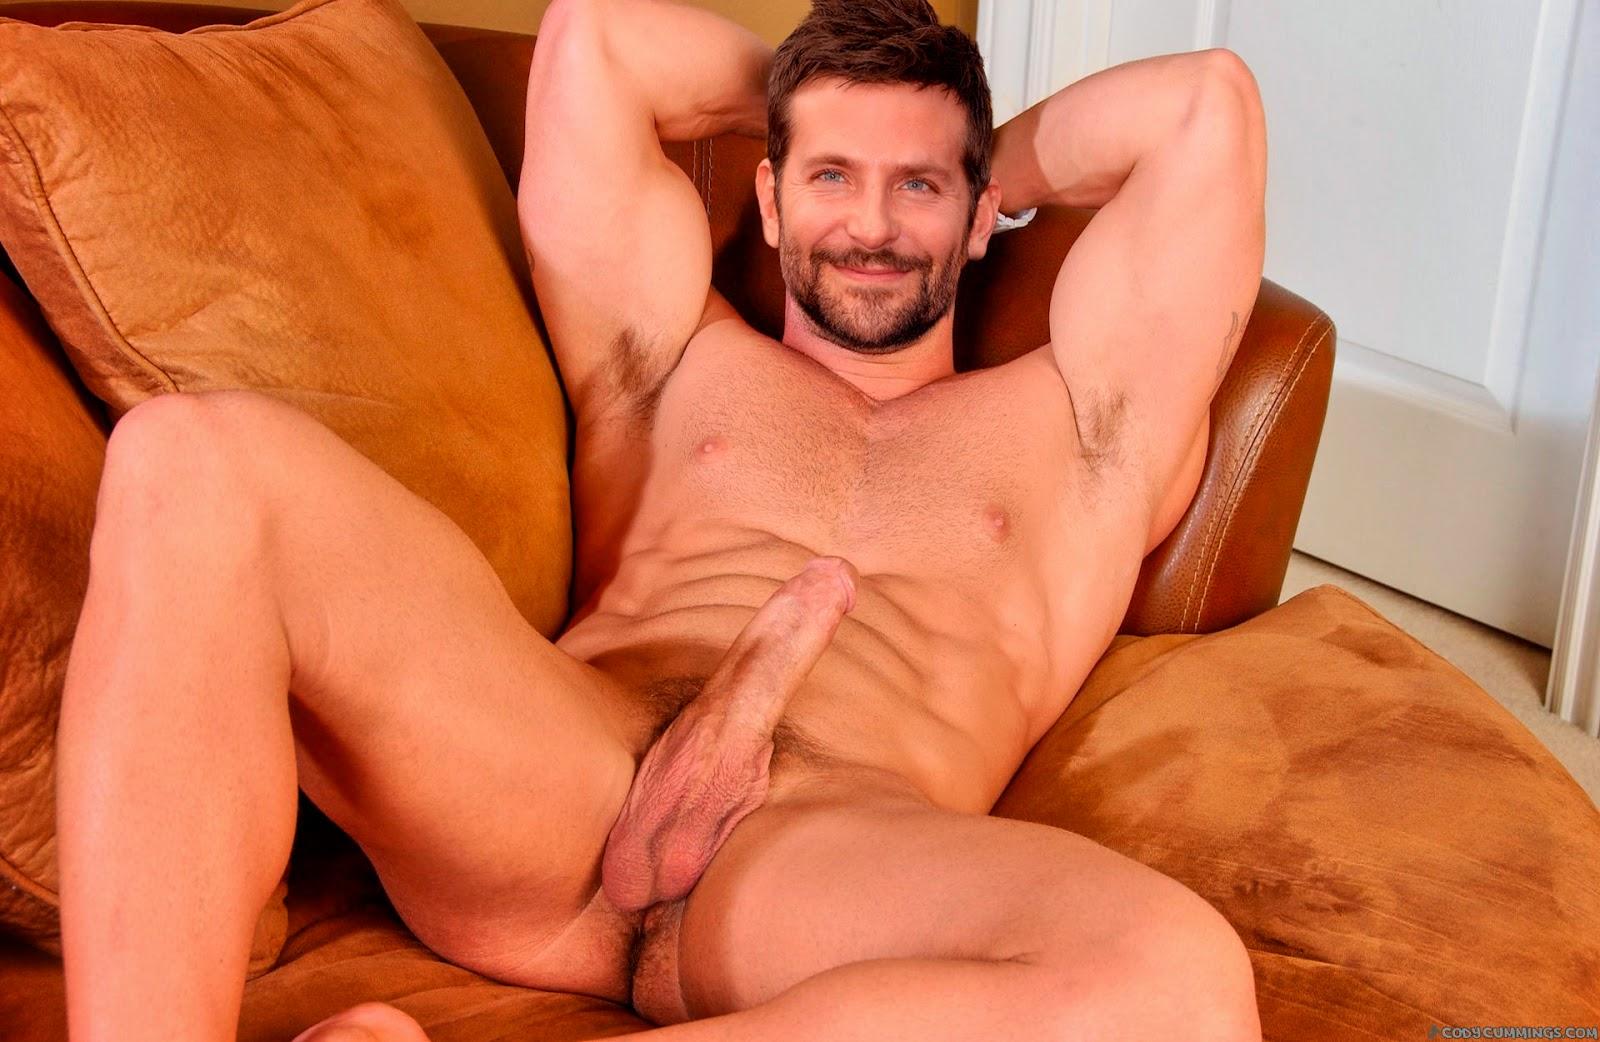 Famosos Desnudos Video Bradley Cooper Desnudo Filmvz Portal